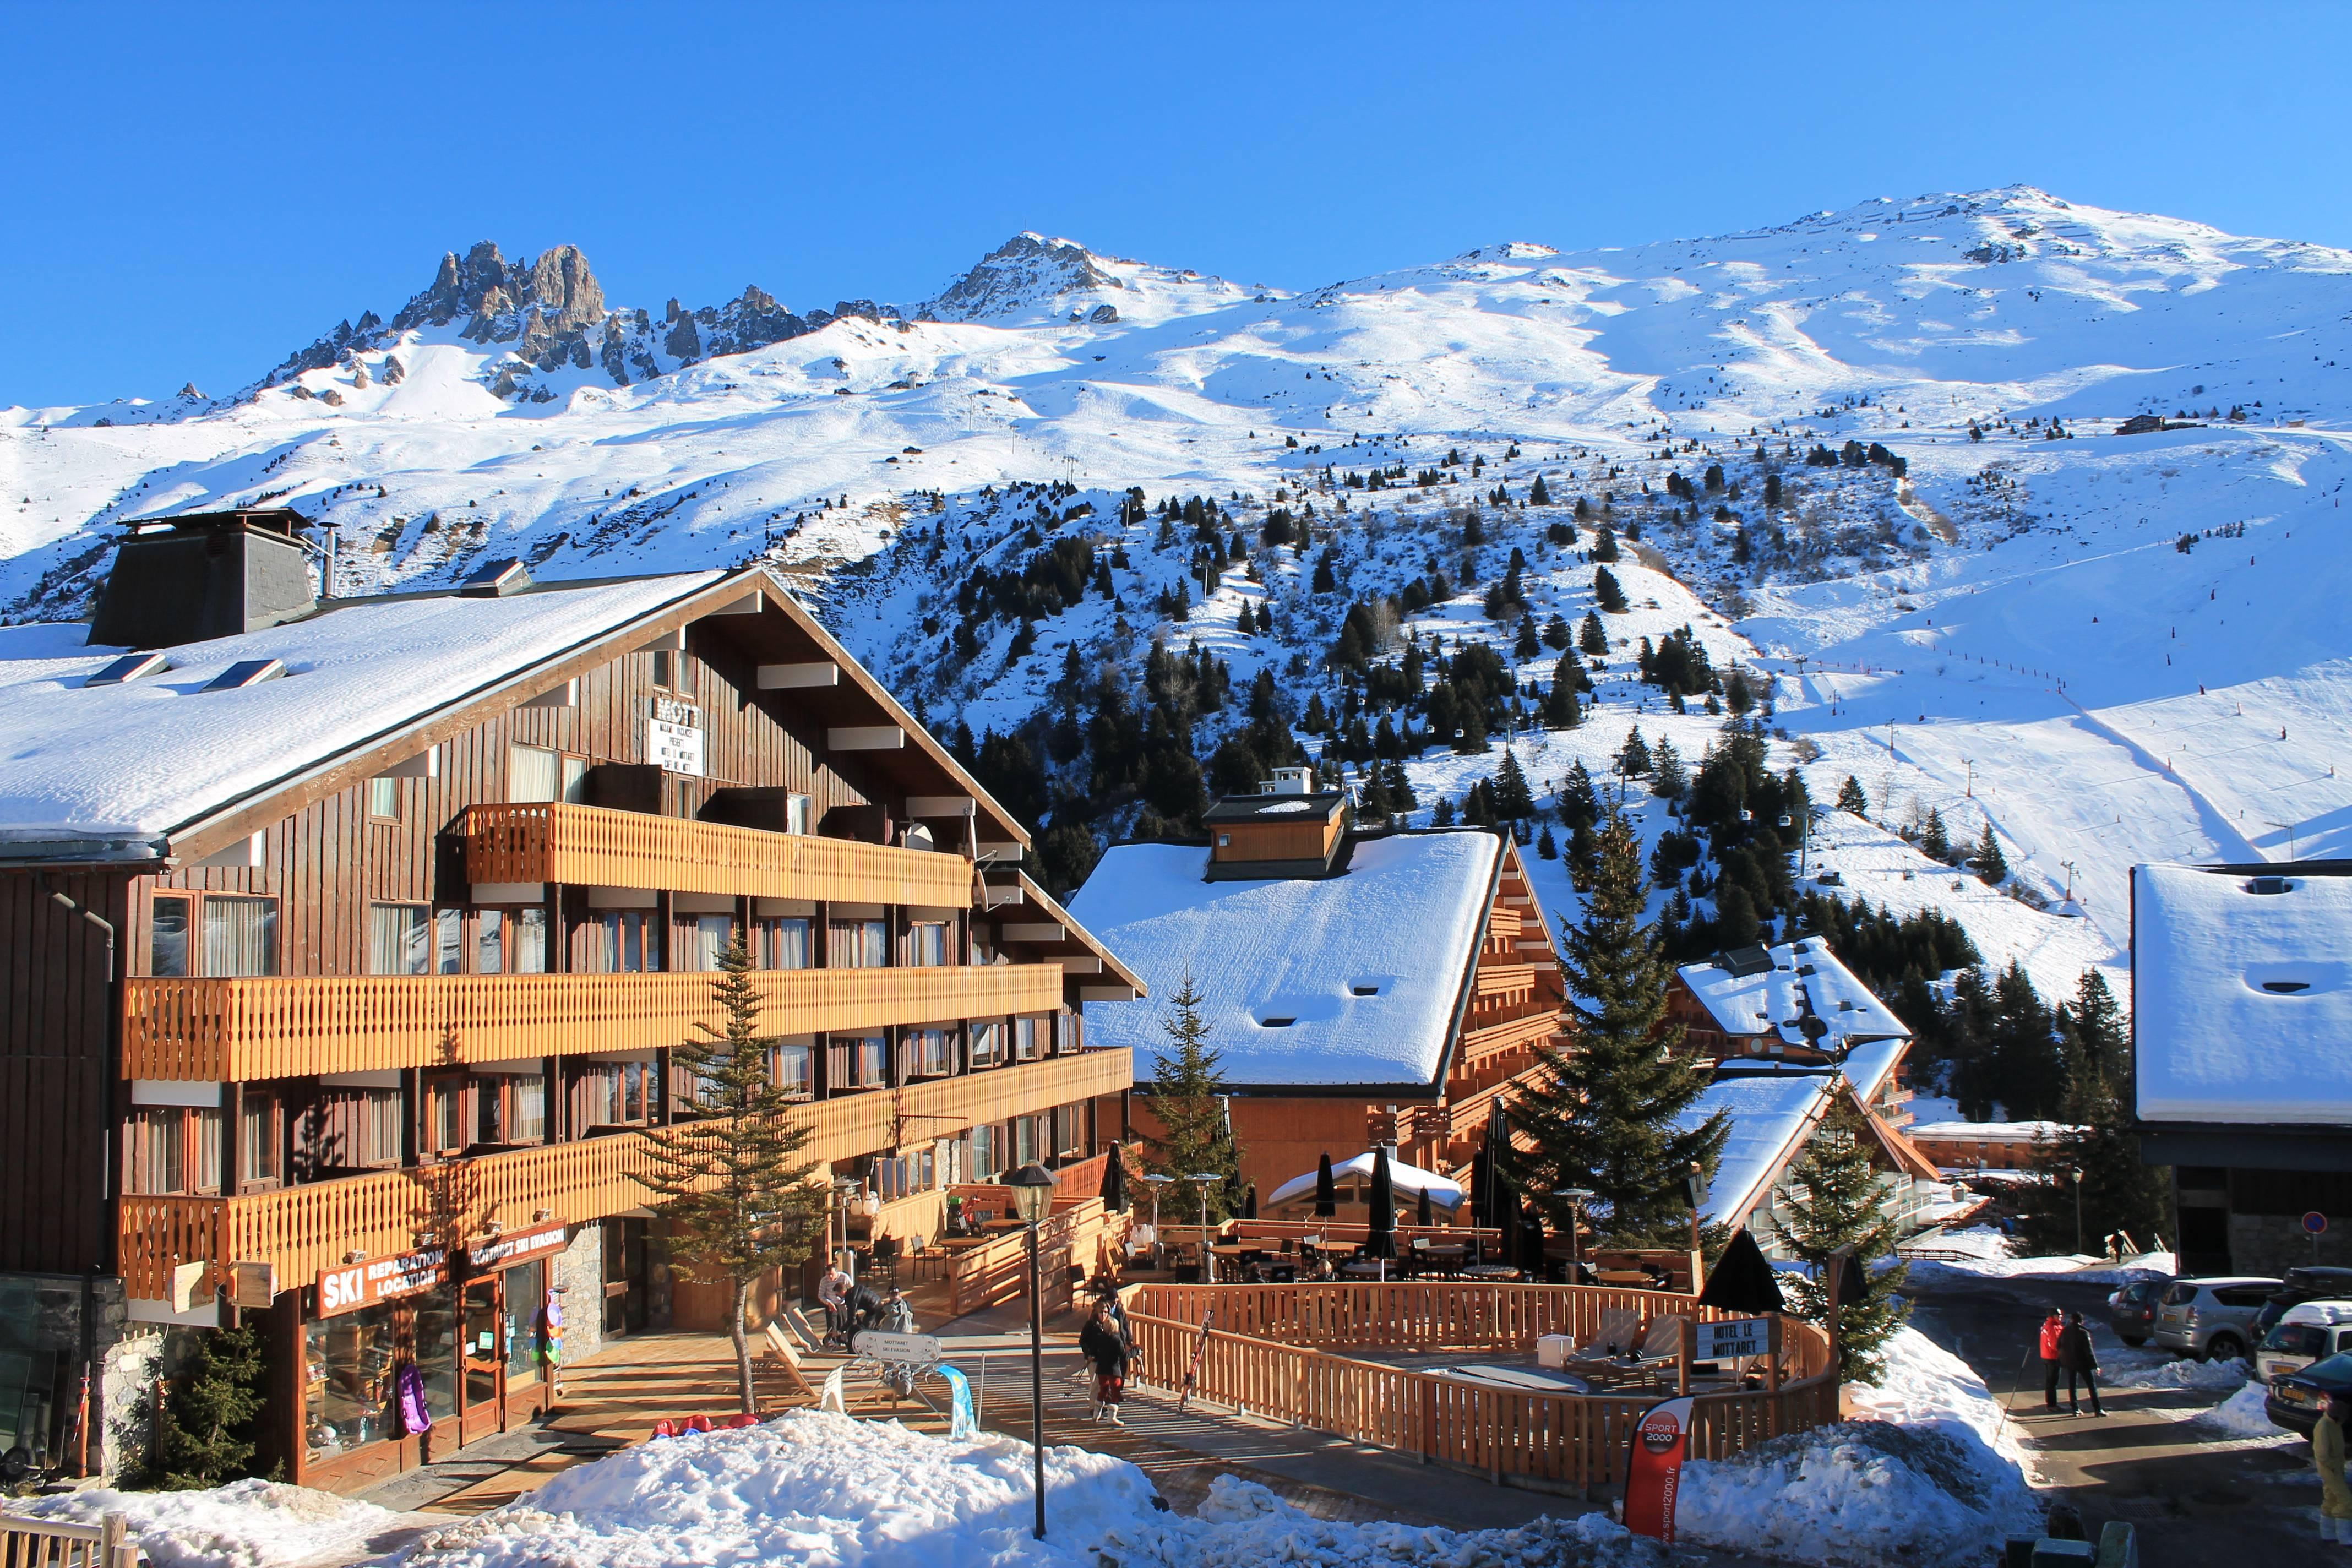 3 Hotel Le Mottaret Ski Hotel In Meribel Mottaret Flexiski